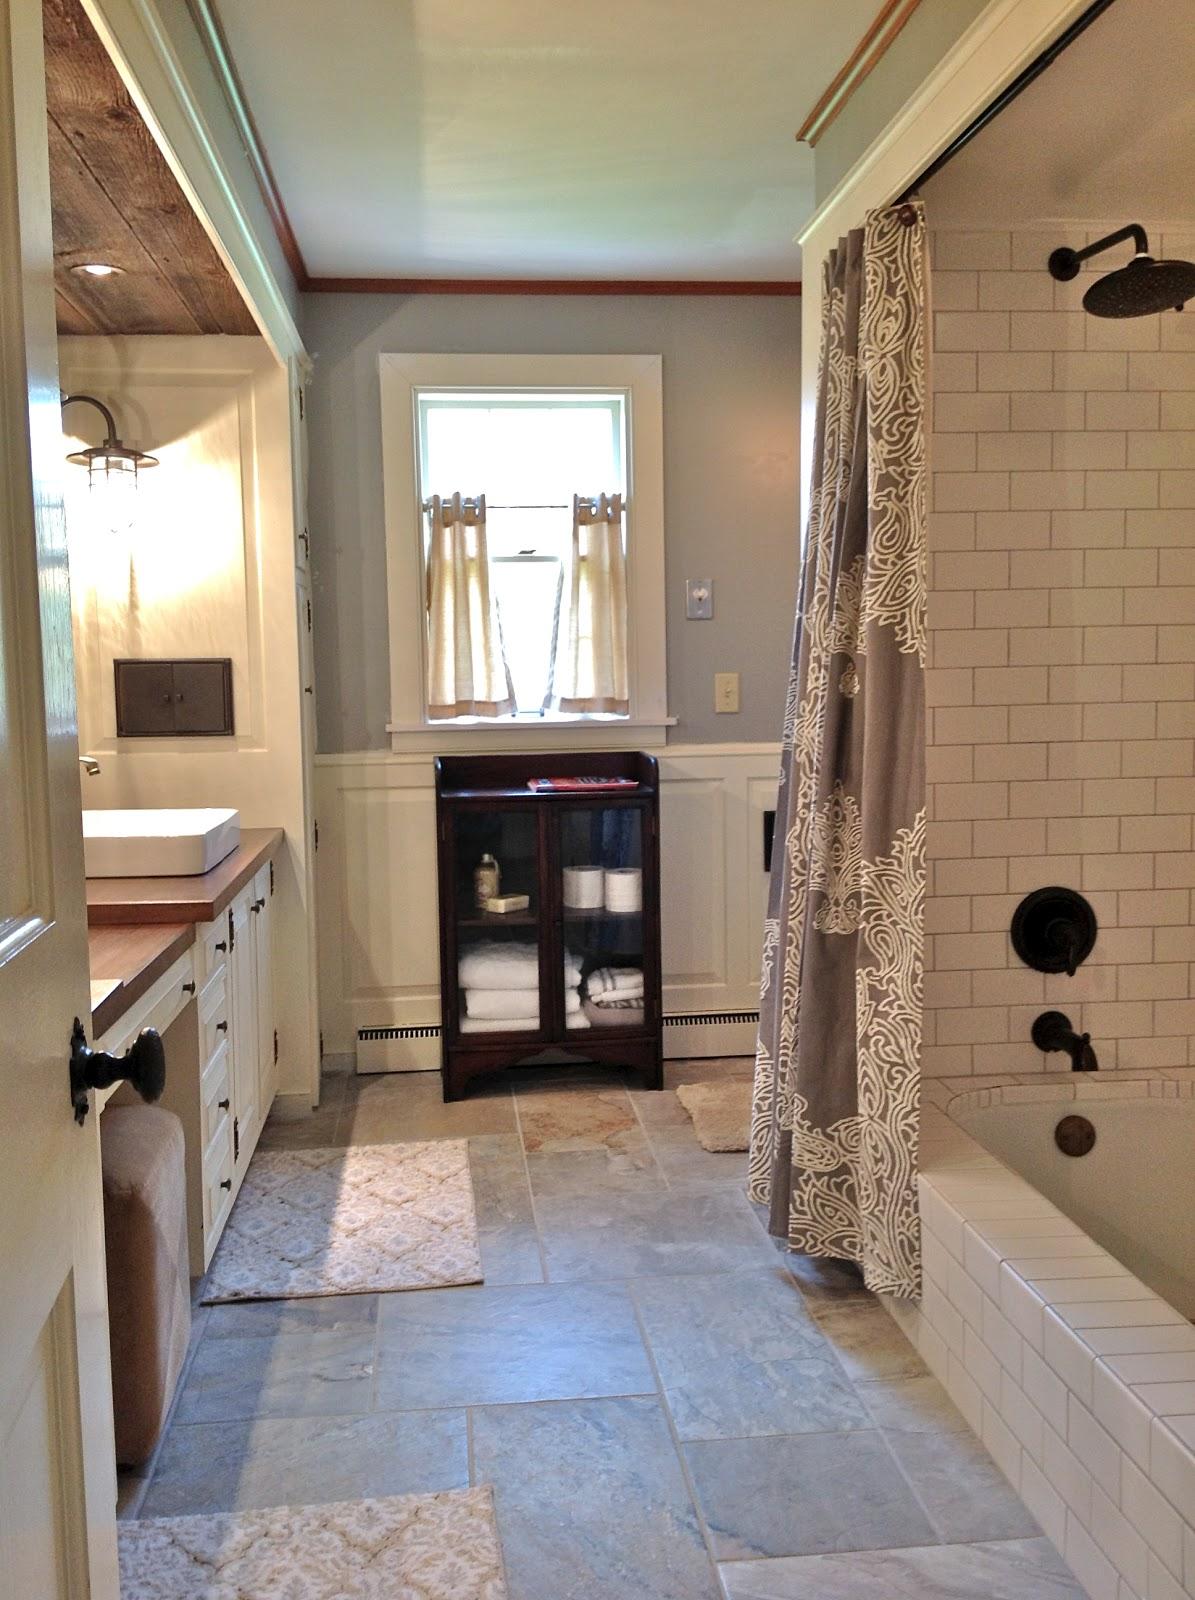 route 2 rural: Farmhouse Bathroom Remodel -- Done! on Farmhouse Shower Ideas  id=64337